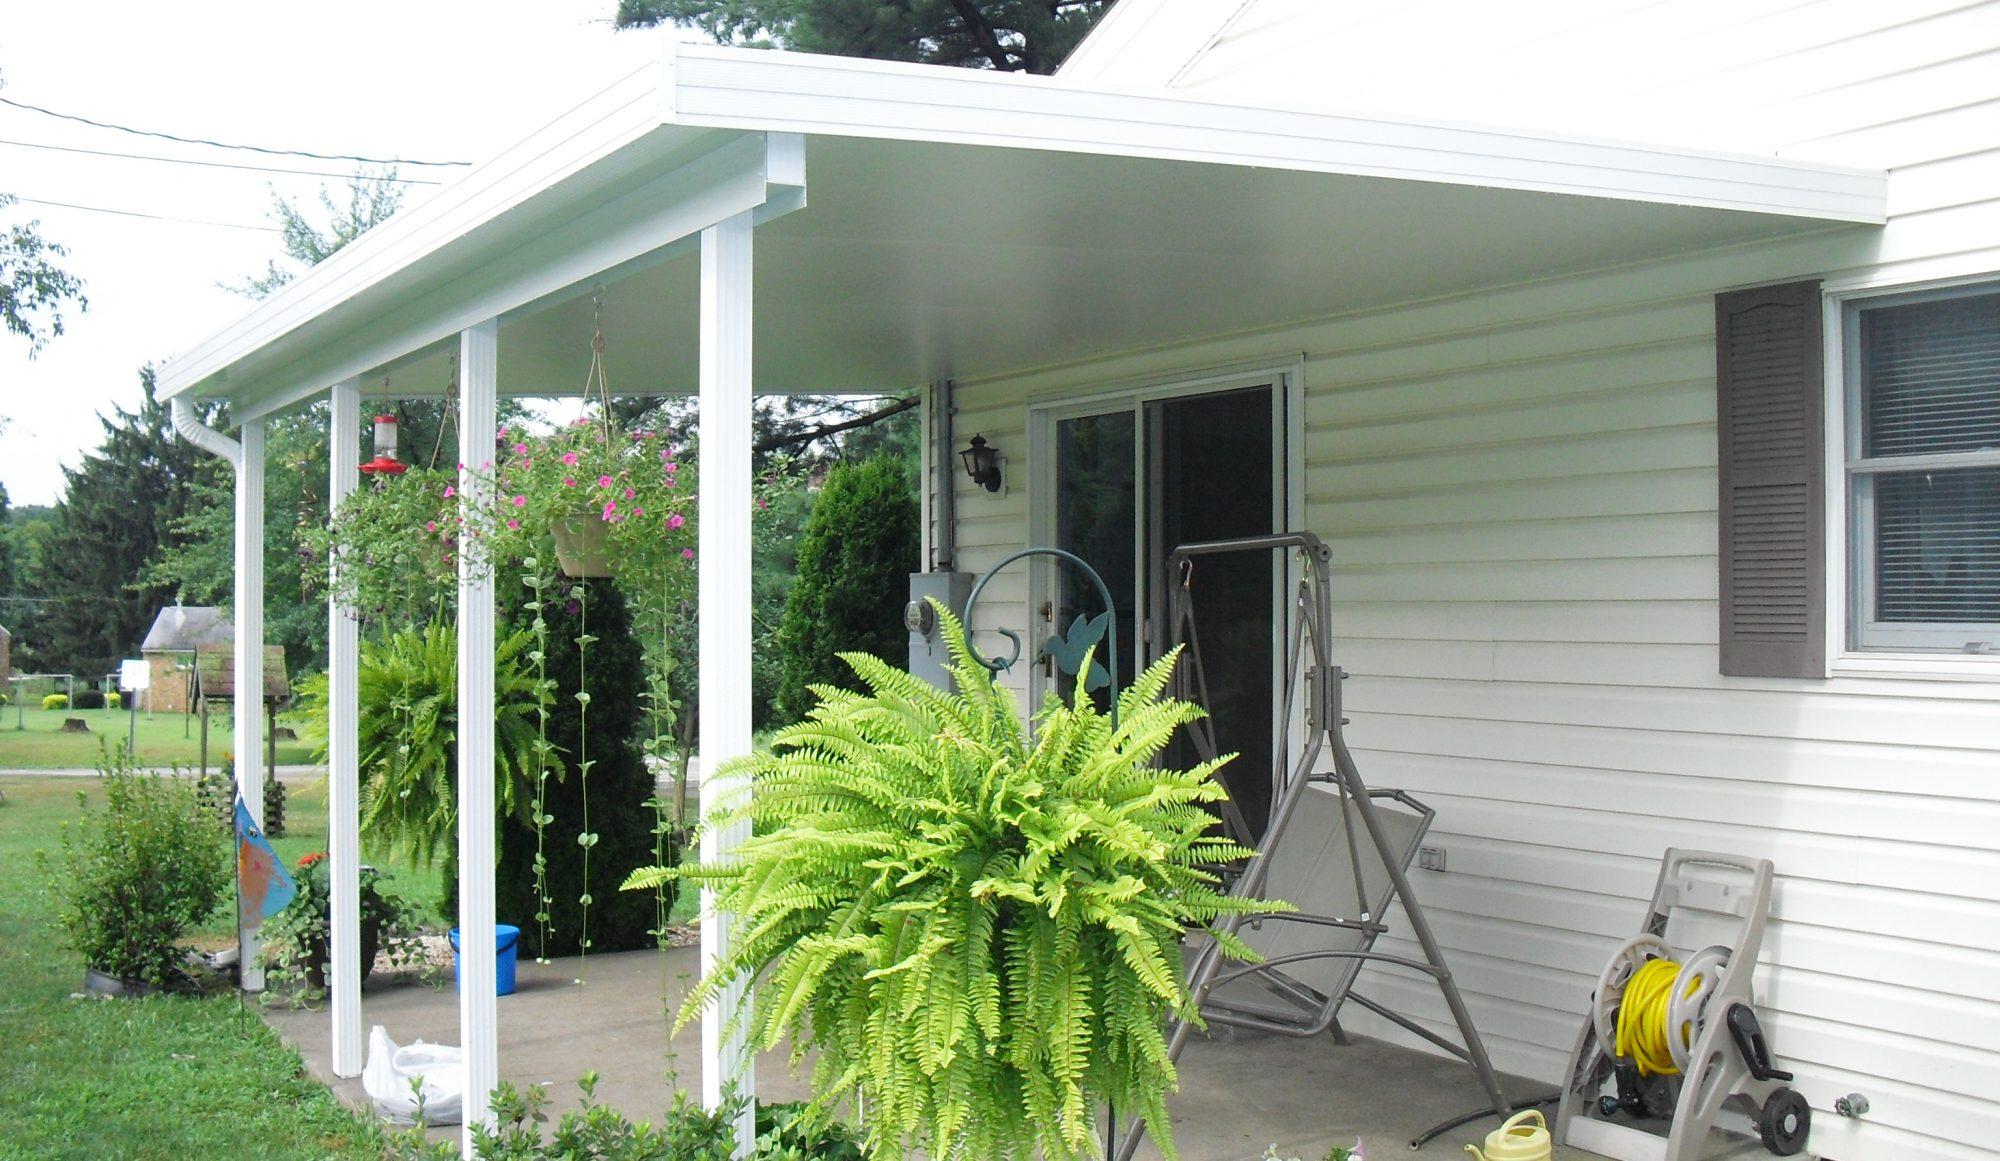 AllPro Home Improvement